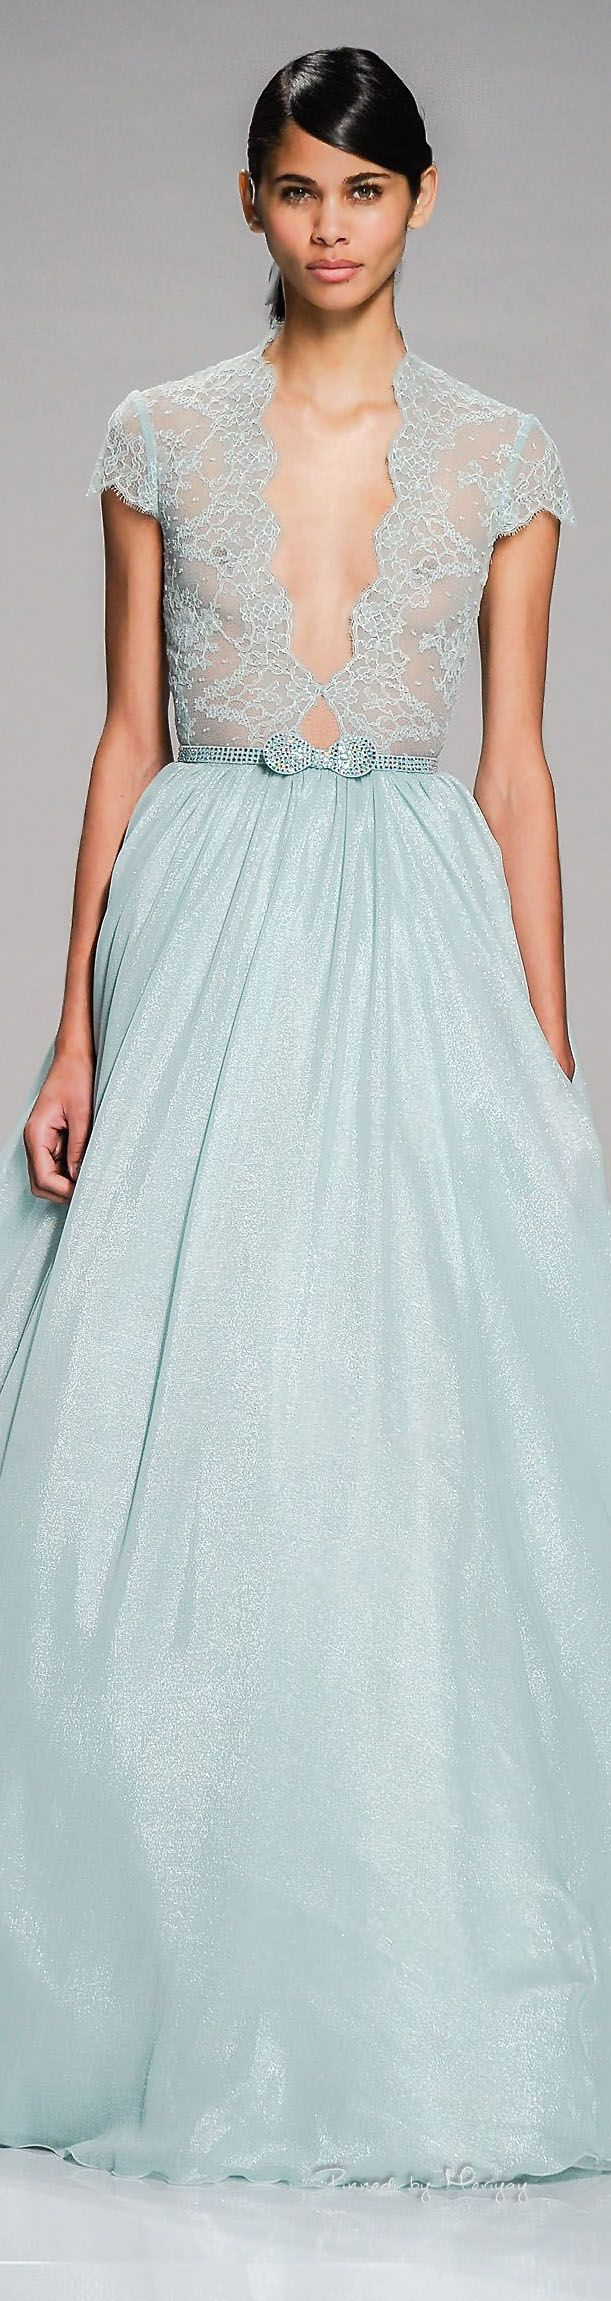 абитуриентска-дизайнерска-рокля-129